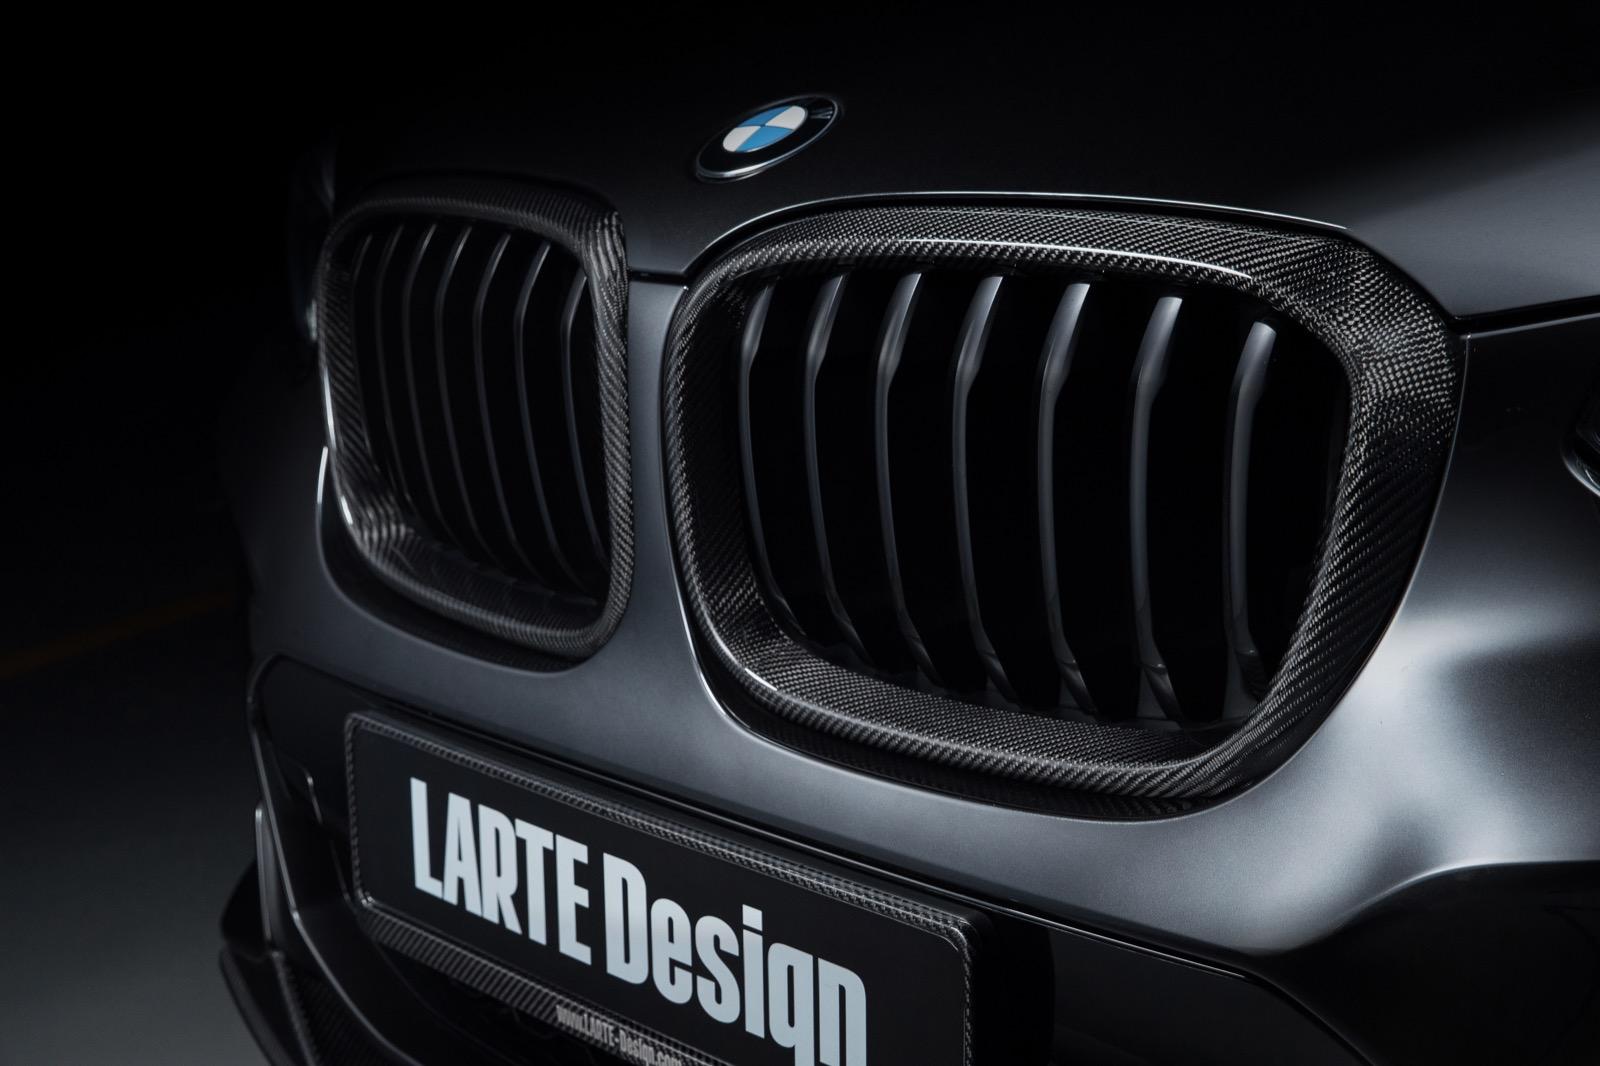 Manhart-Larte-Design-BMW-X3-X4-8